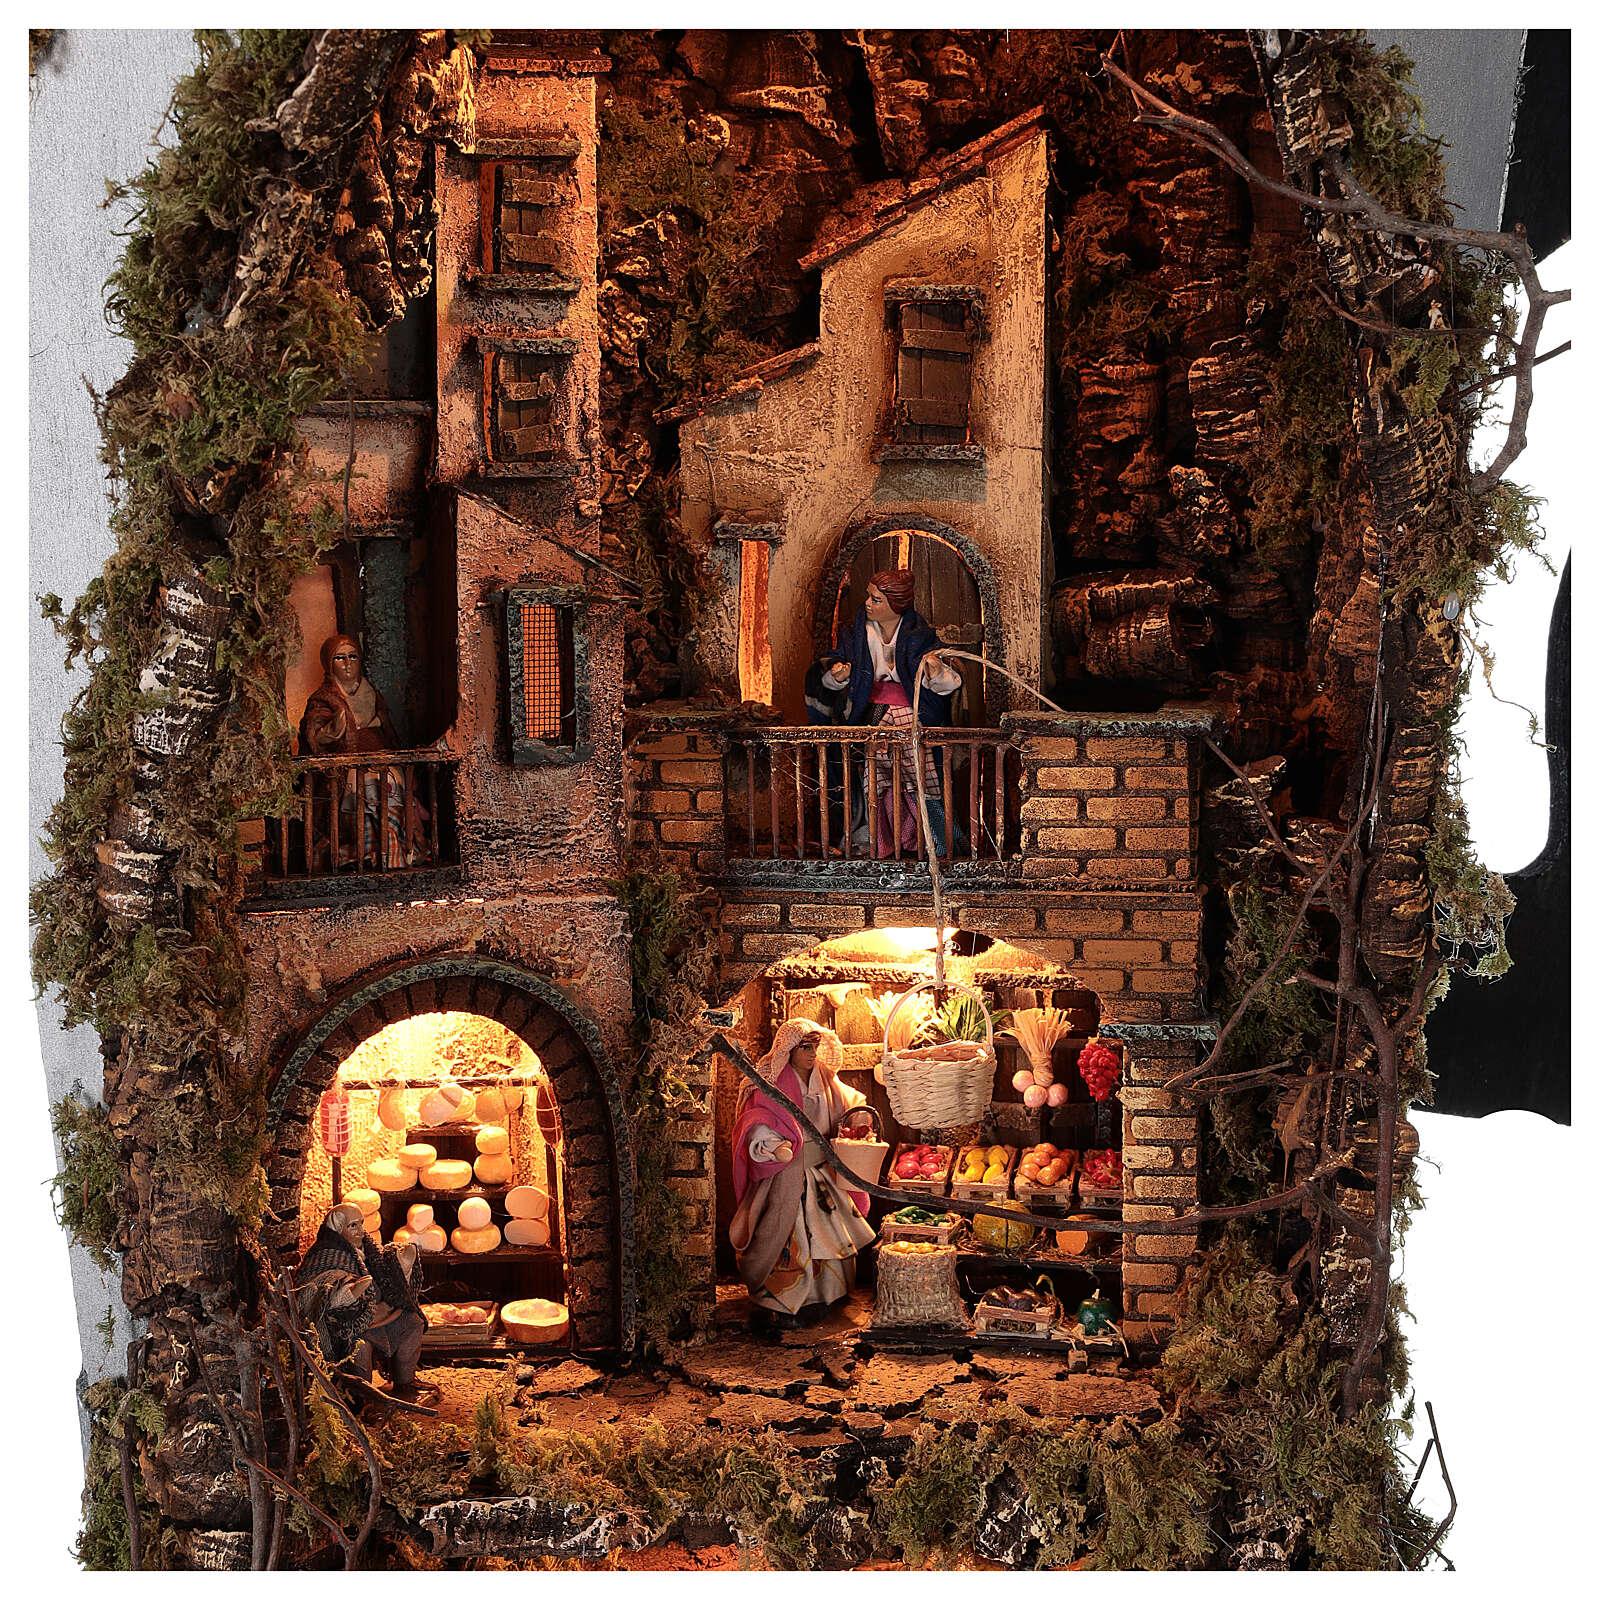 Moka pot Nativity Scene REAL SMOKE 100x60x50 cm Neapolitan Nativity Scene for figurines of 8 cm average height 4